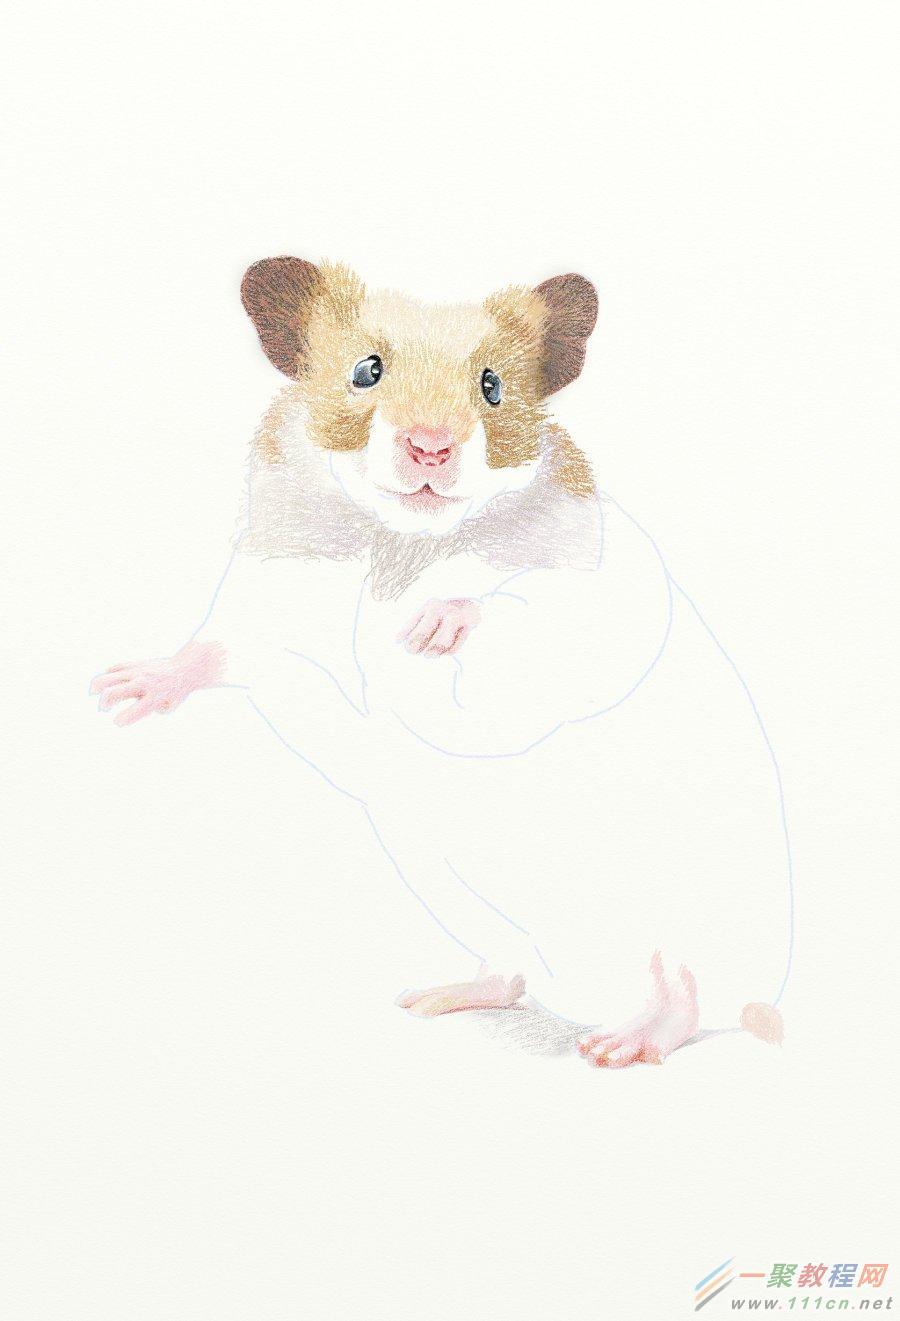 painter绘制一只可爱水粉效果老鼠教程